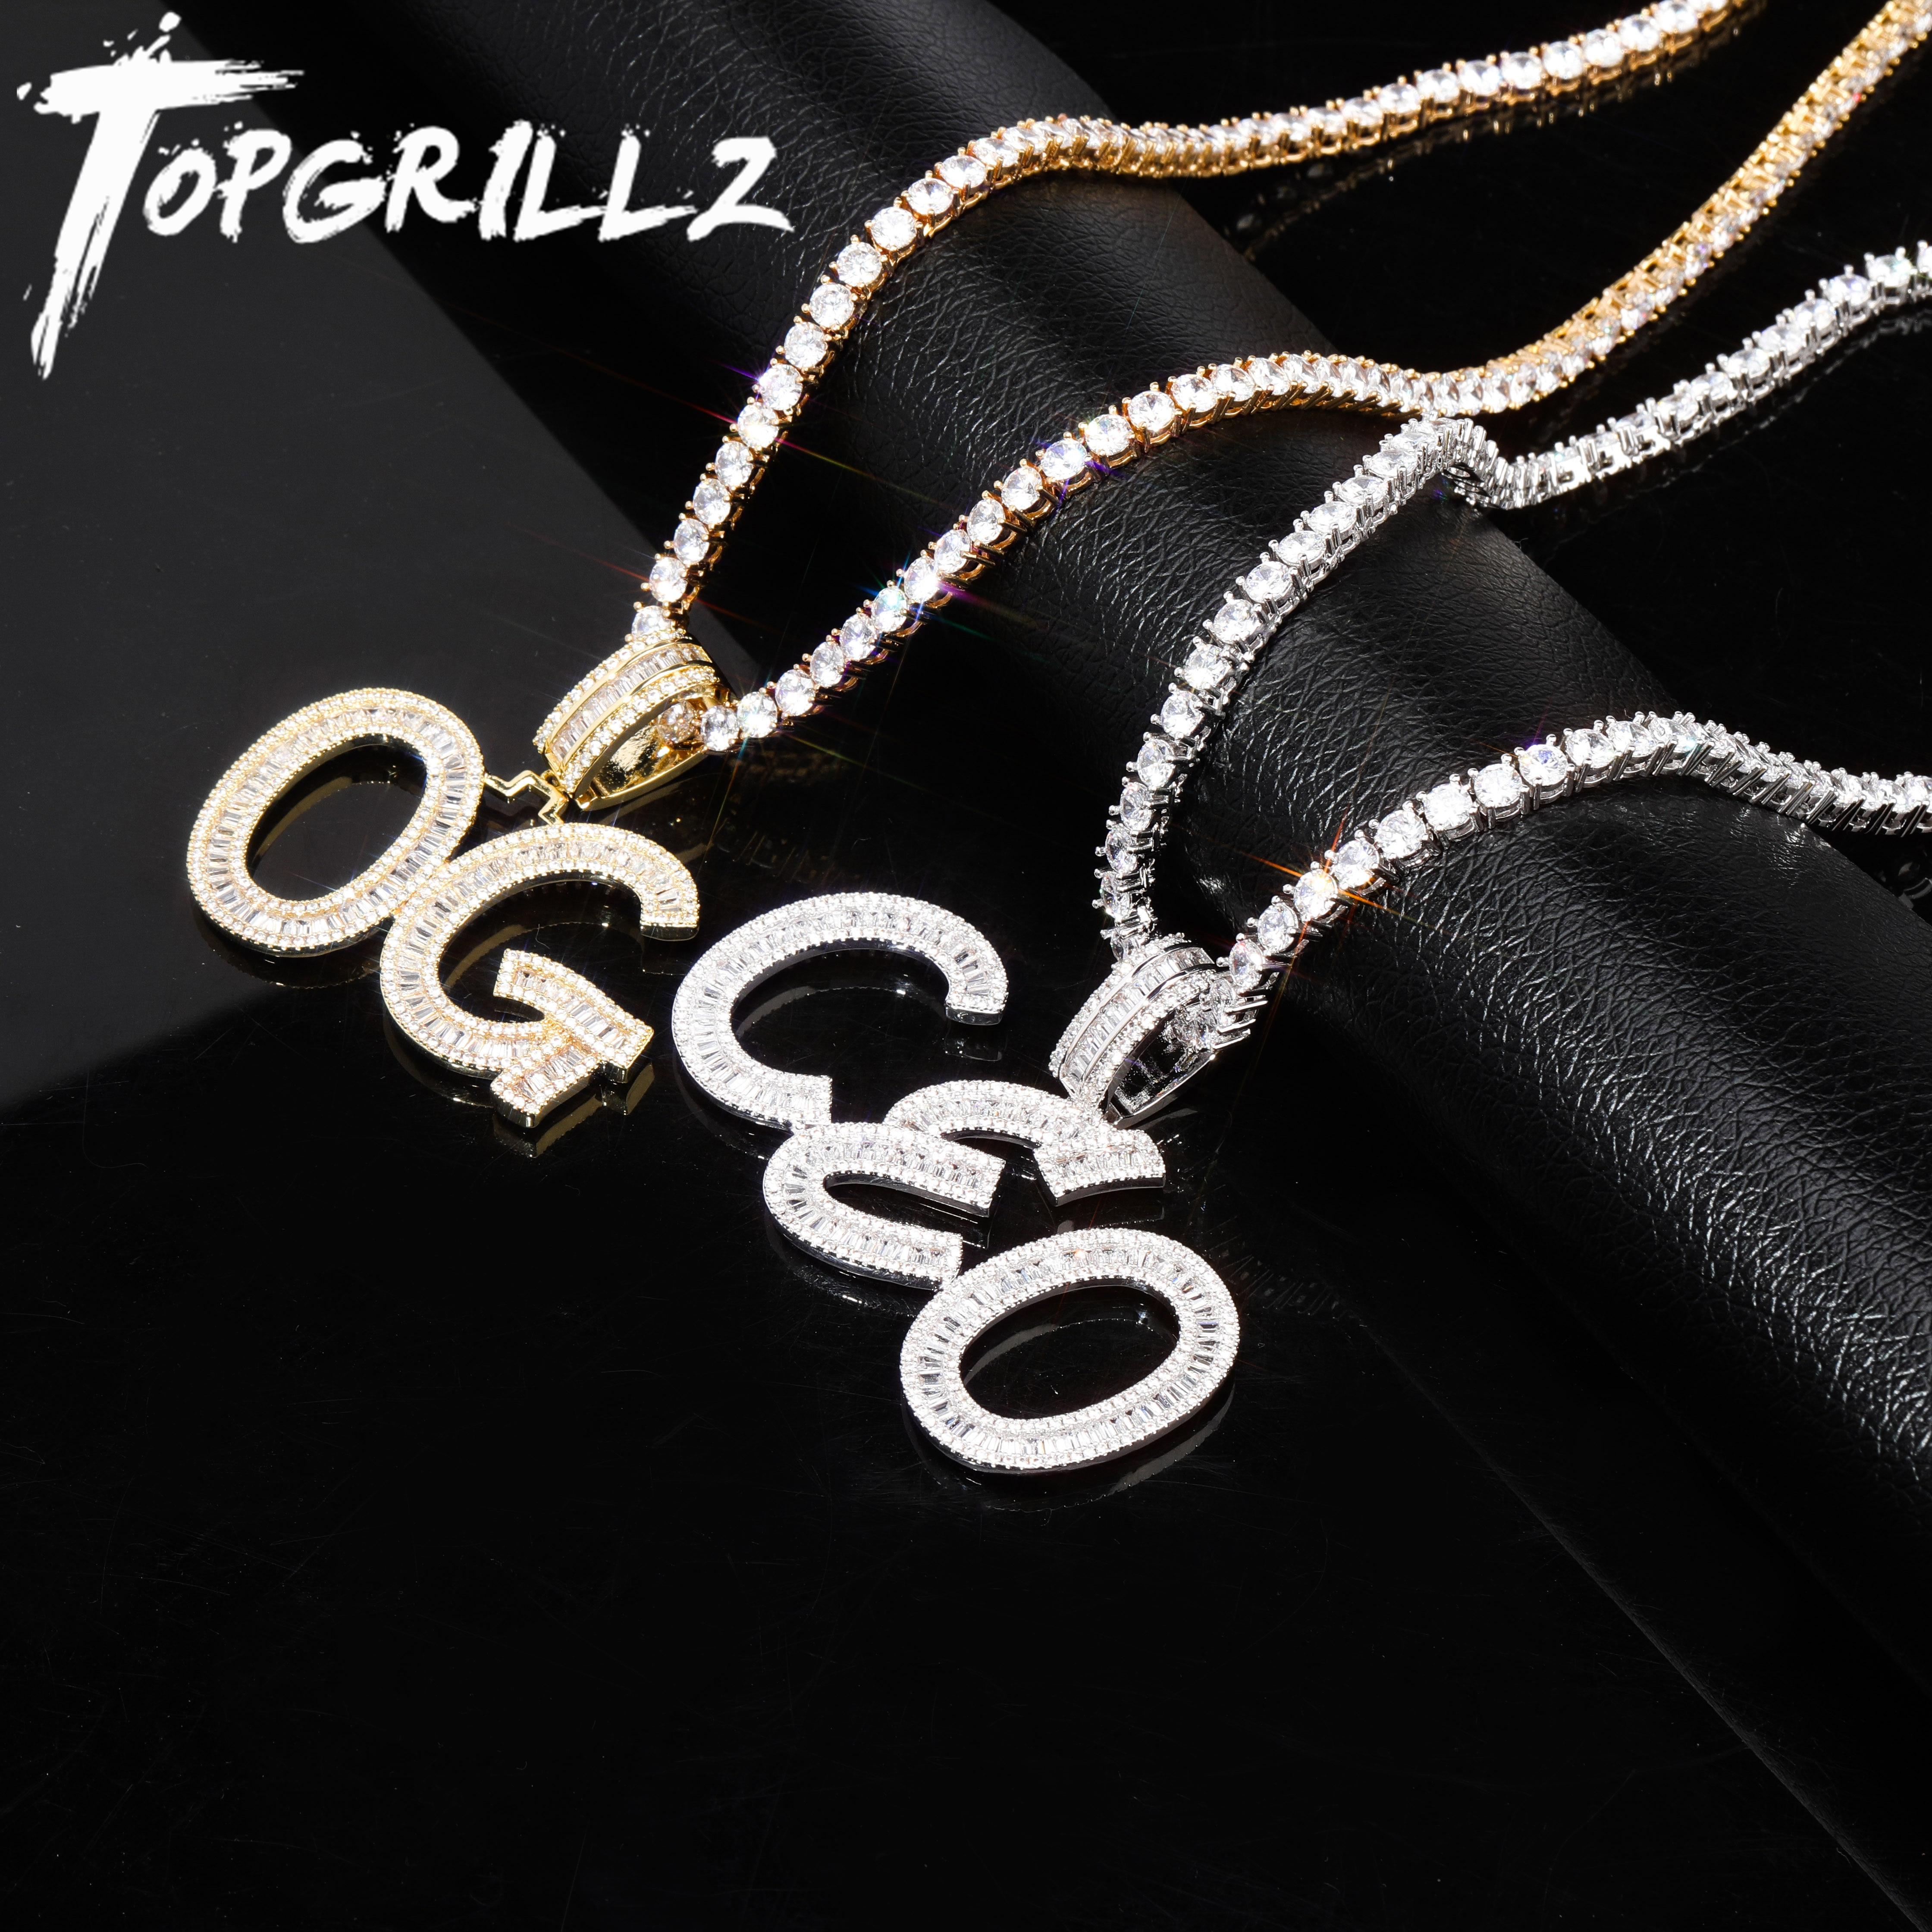 TOPGRILLZ Custom Name Baguette Stone Letters Hip Hop Pendant Chain Gold Silver Bling Zirconia Men's Hip Hop Pendant Jewelry